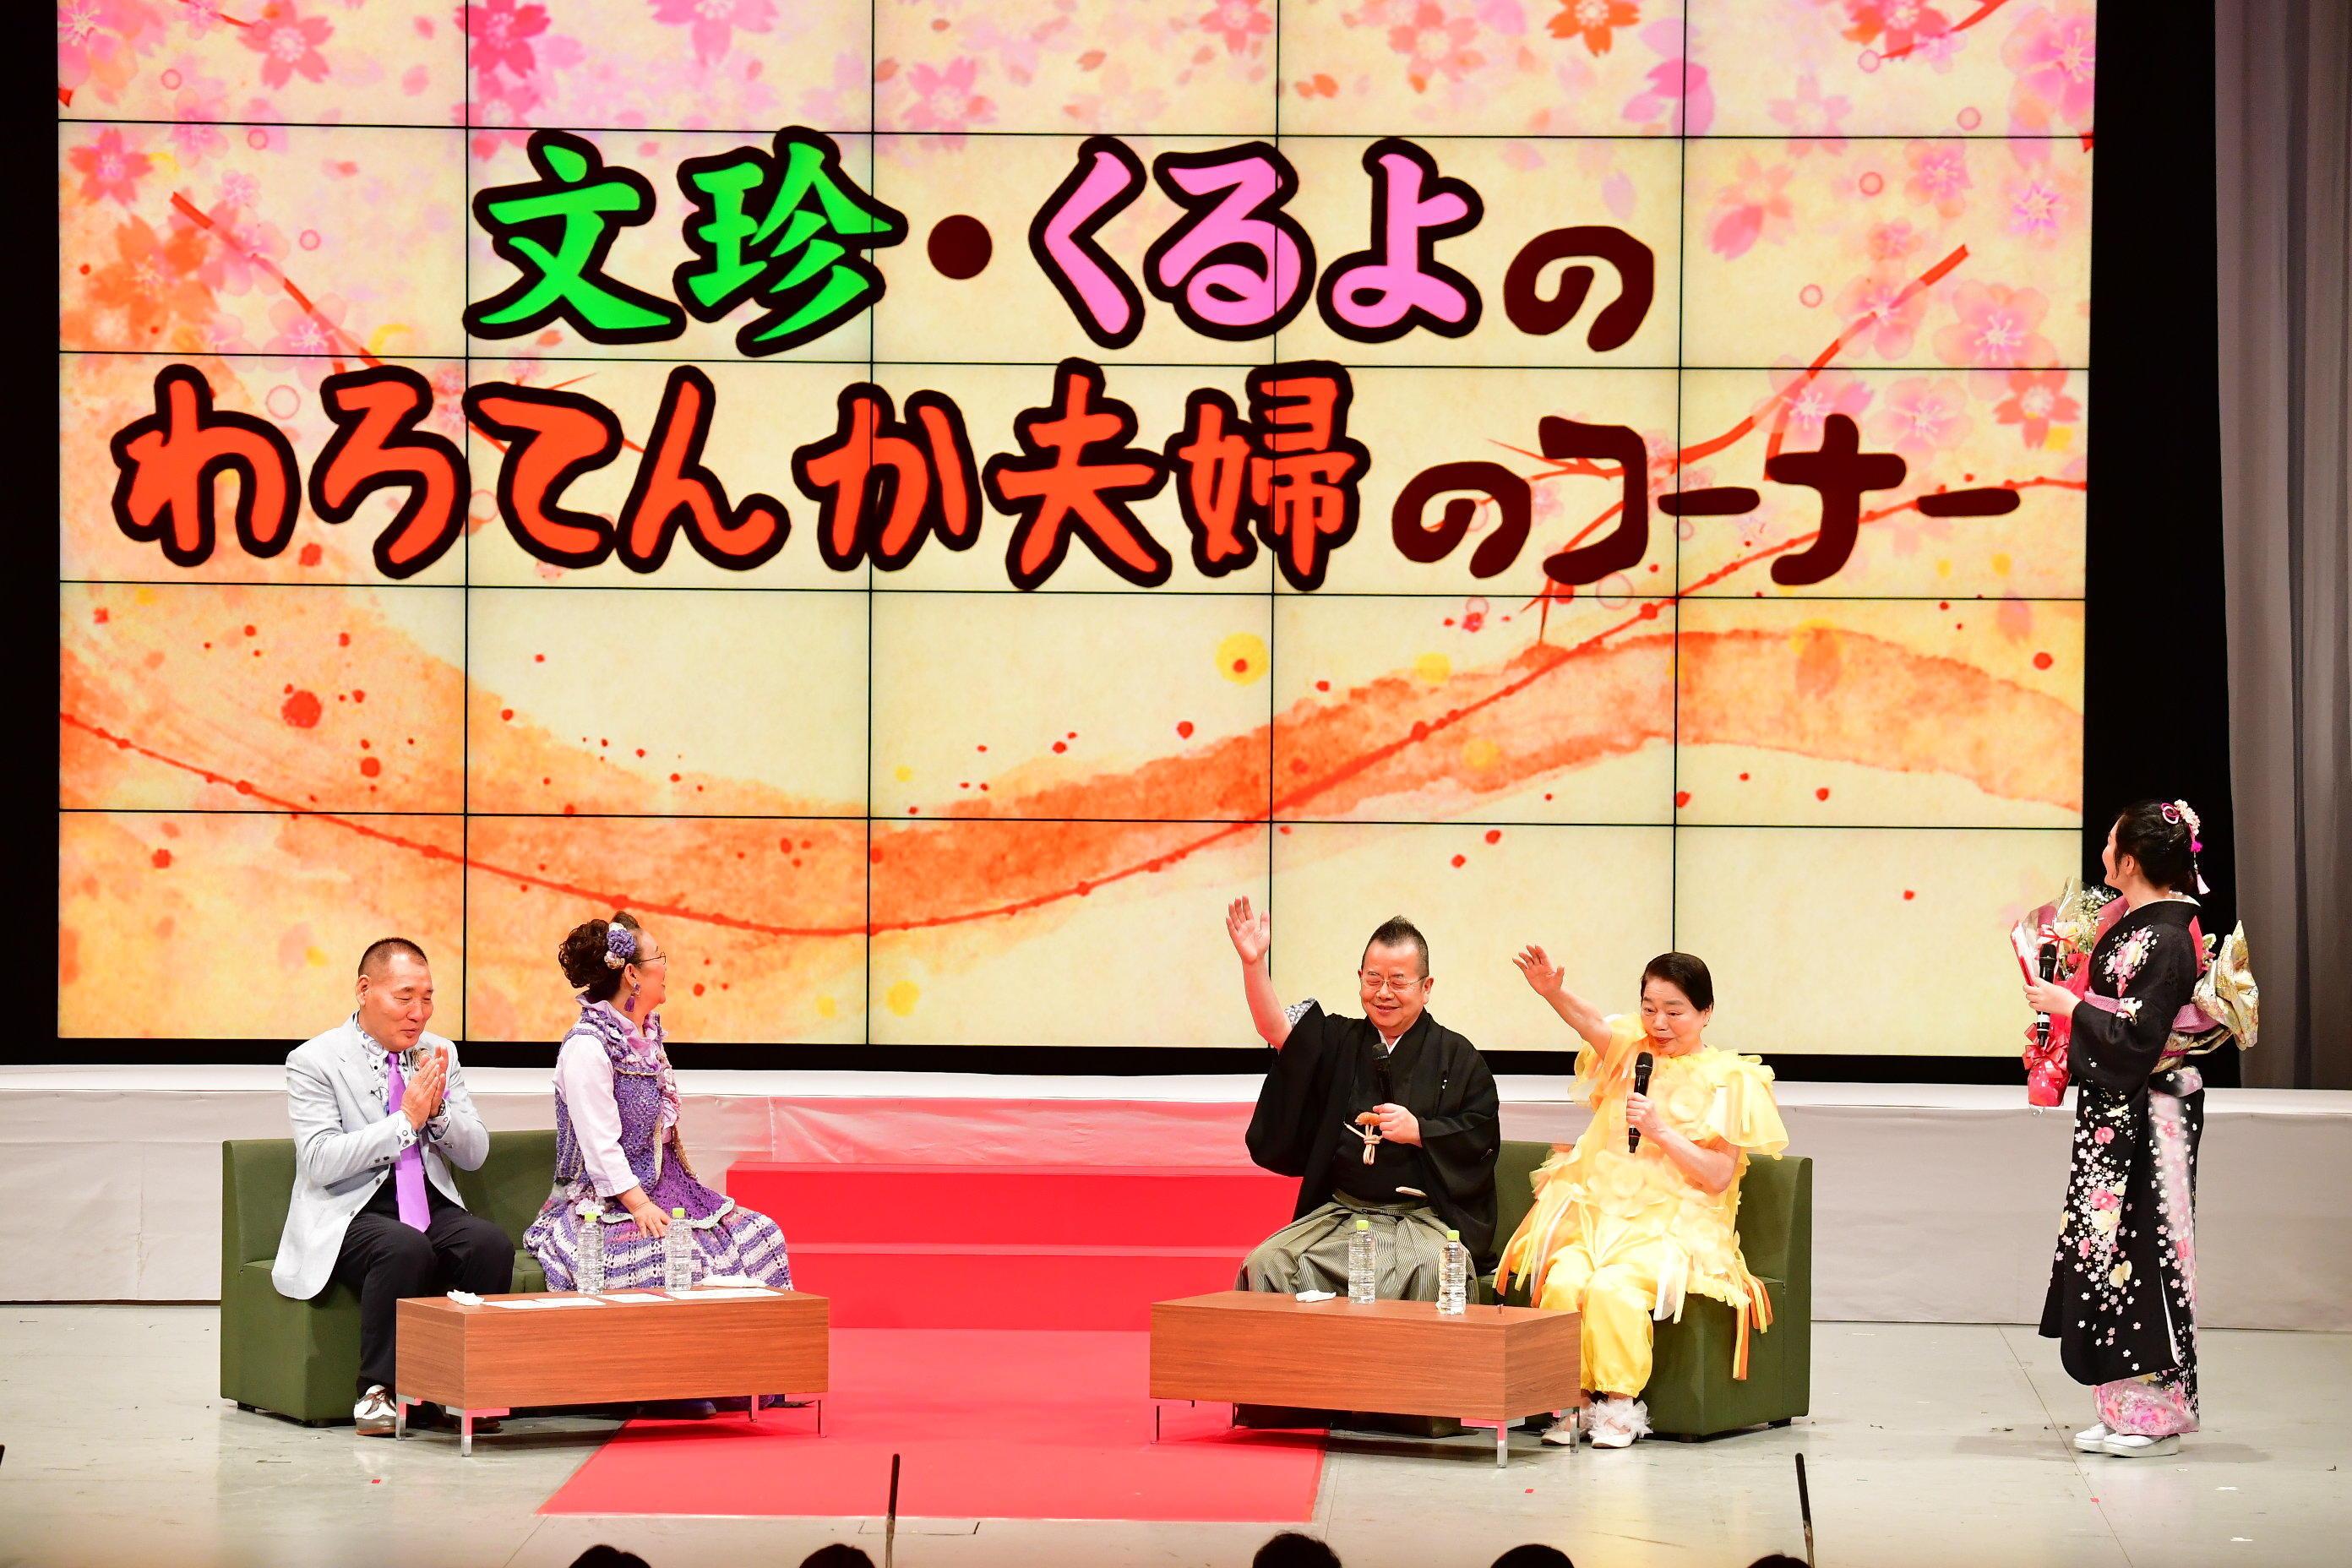 http://news.yoshimoto.co.jp/20180402070555-c3a8c58d909b9c5b429b257d8f3983ff238e0006.jpg